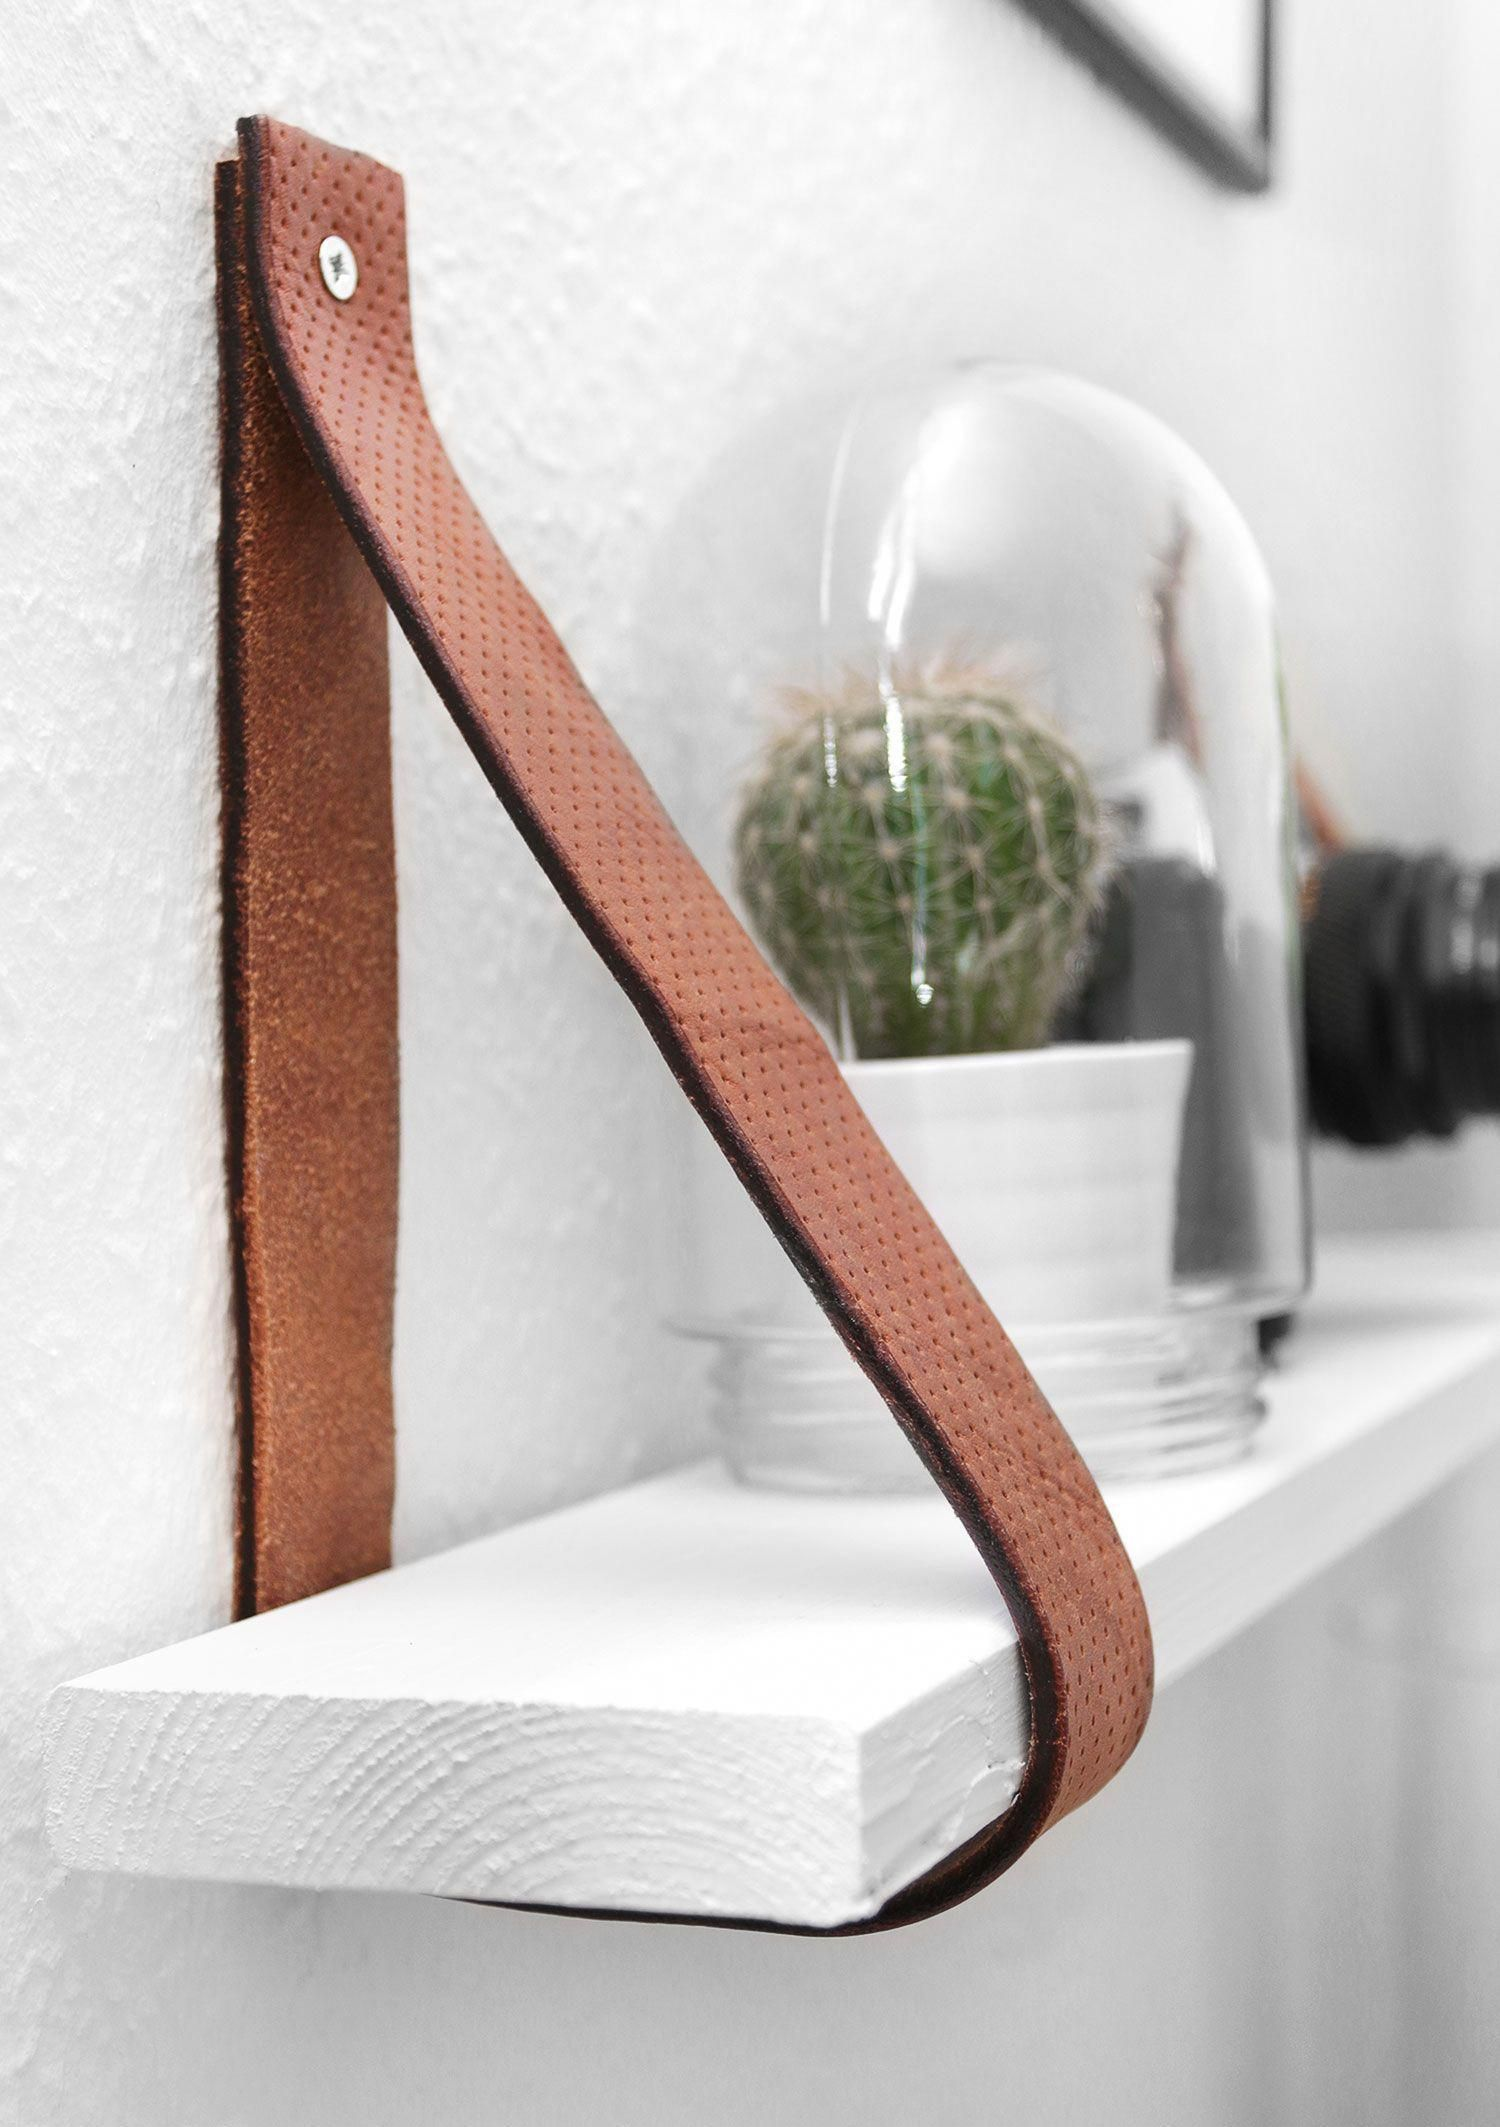 Diy ideas best cheap ways to decorate your home udcheaphomedecordiy